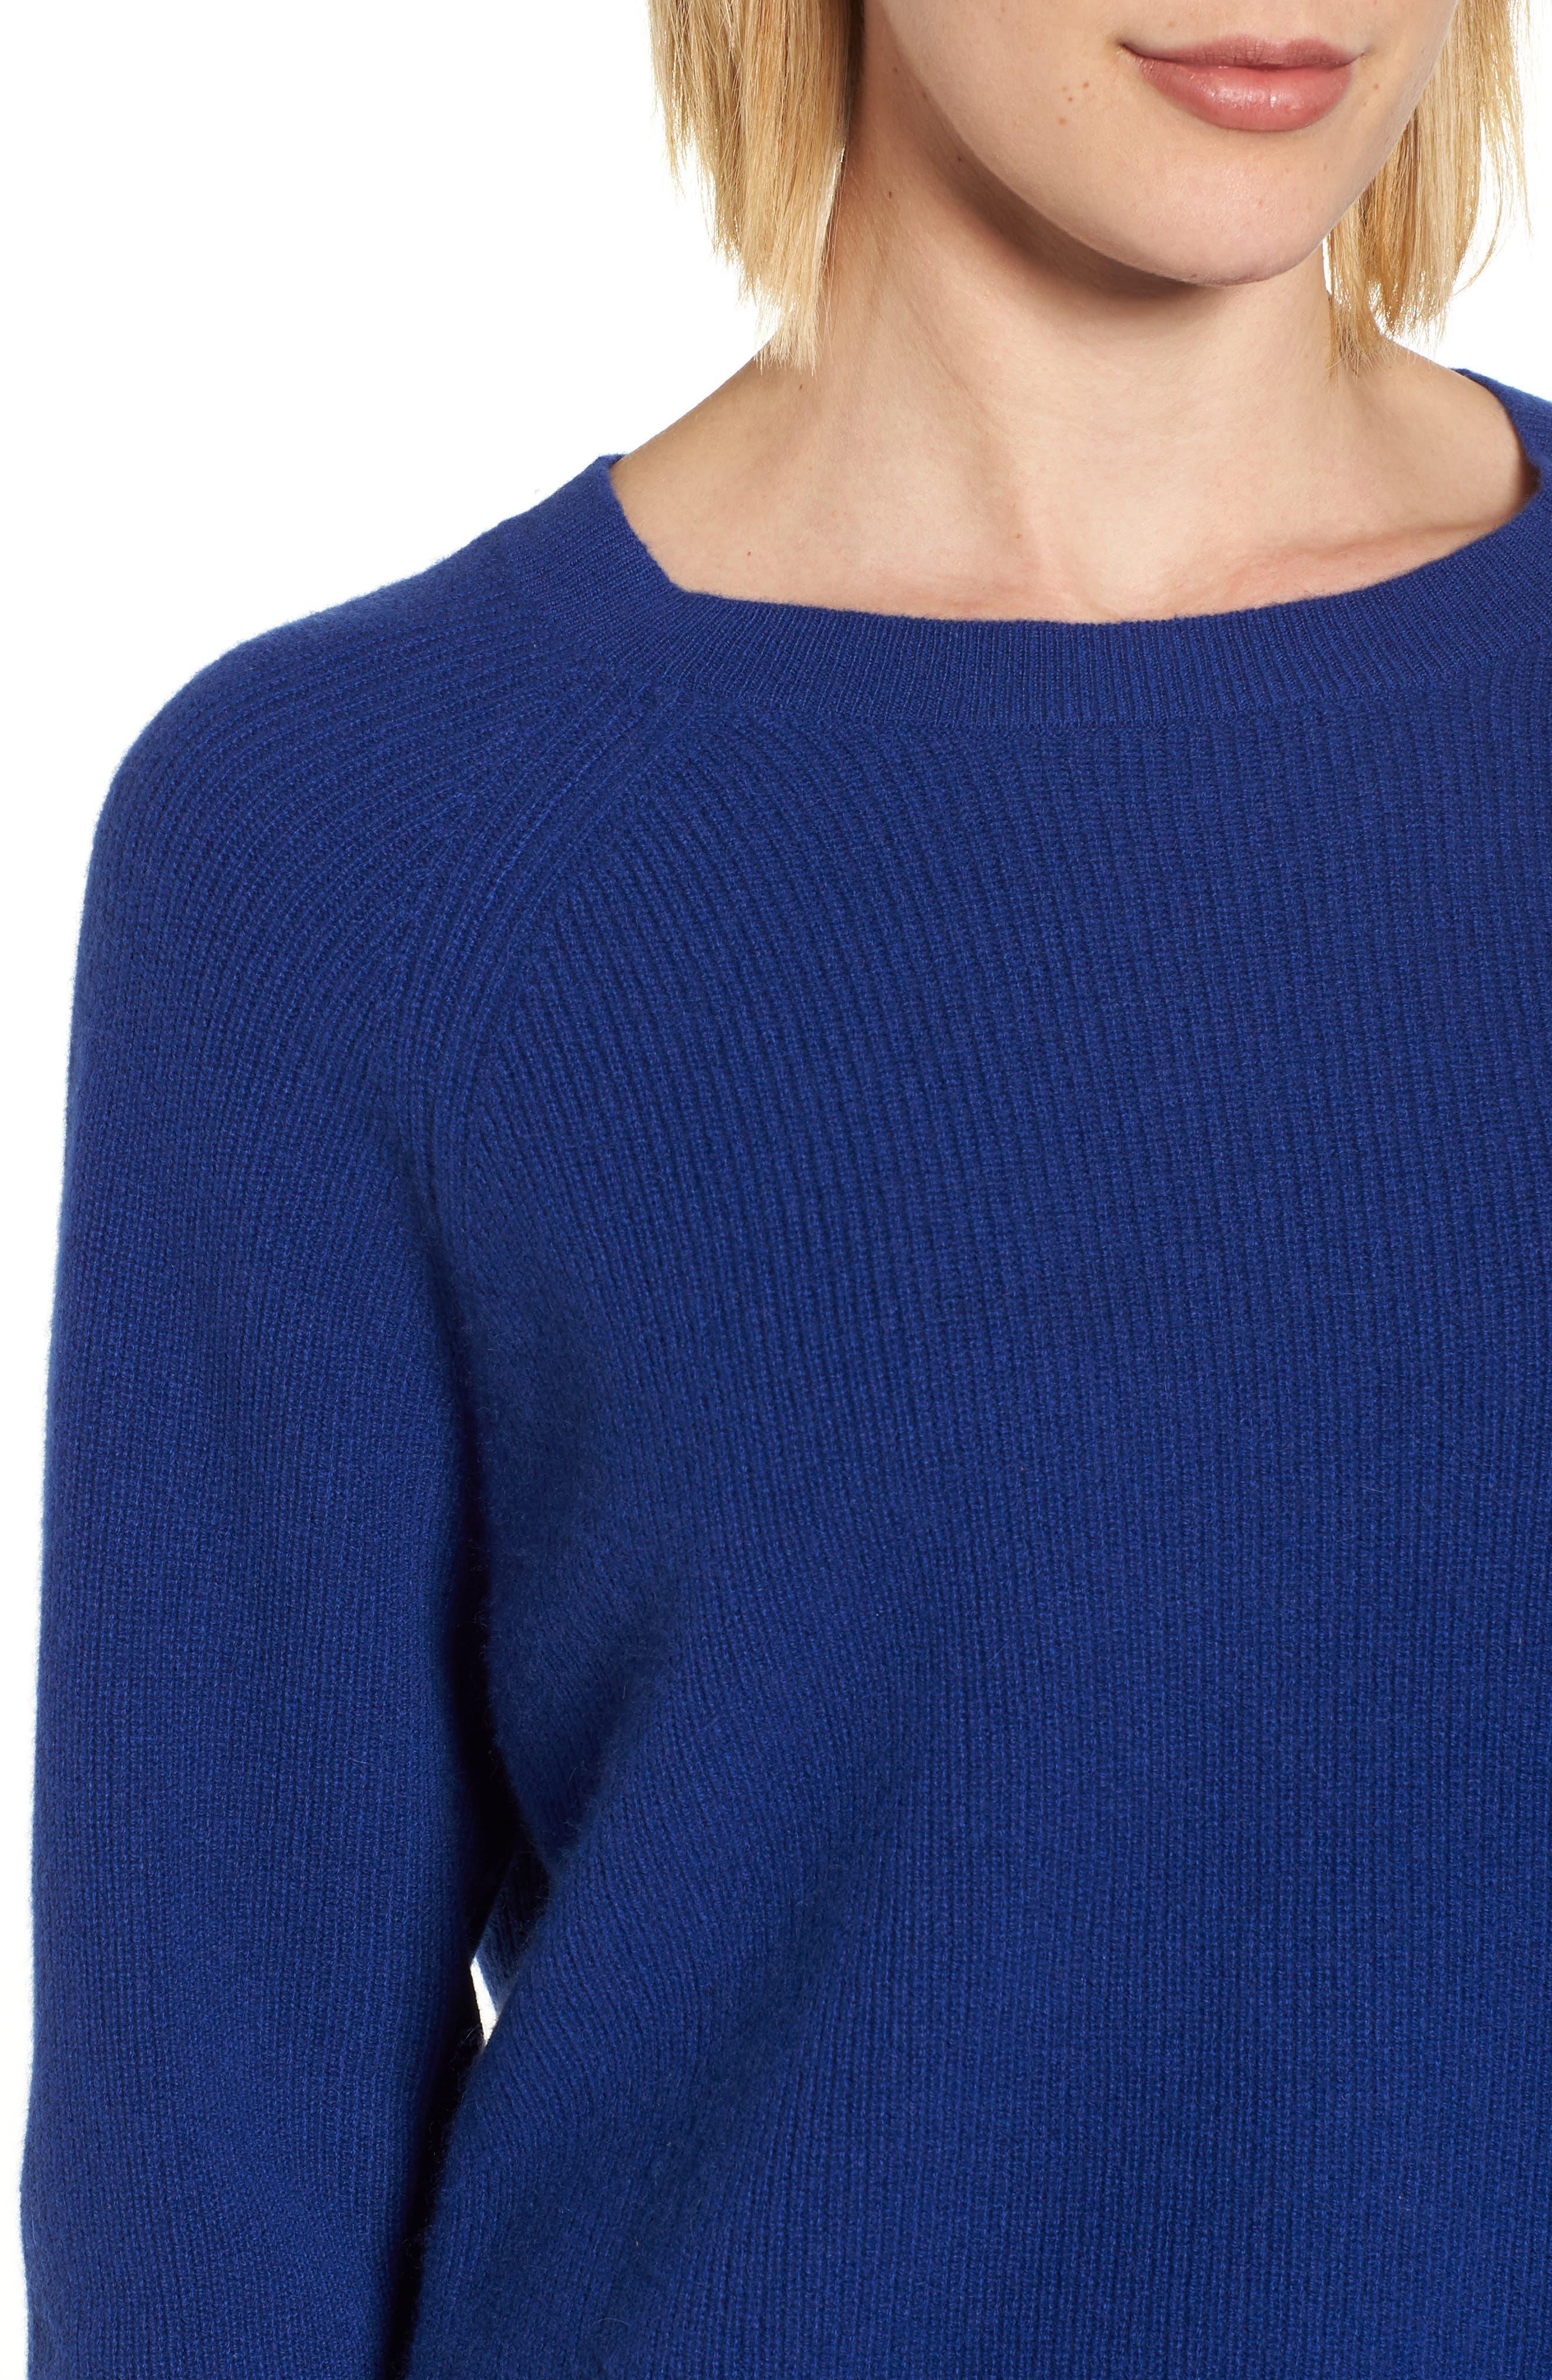 Cashmere Sweater,                             Alternate thumbnail 4, color,                             474